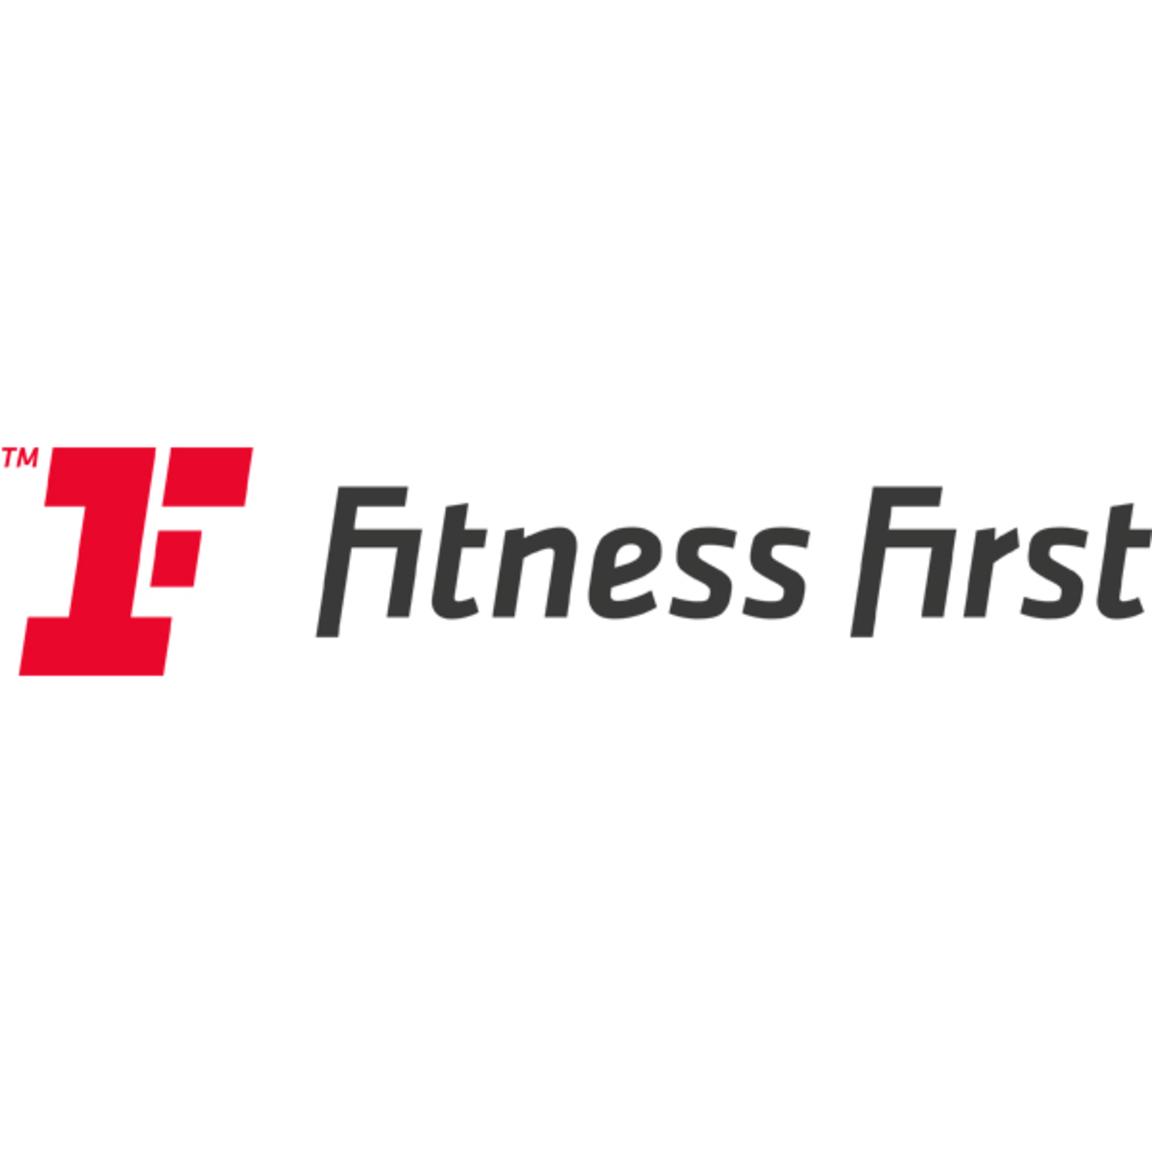 Fitness First at Westfield Parramatta.